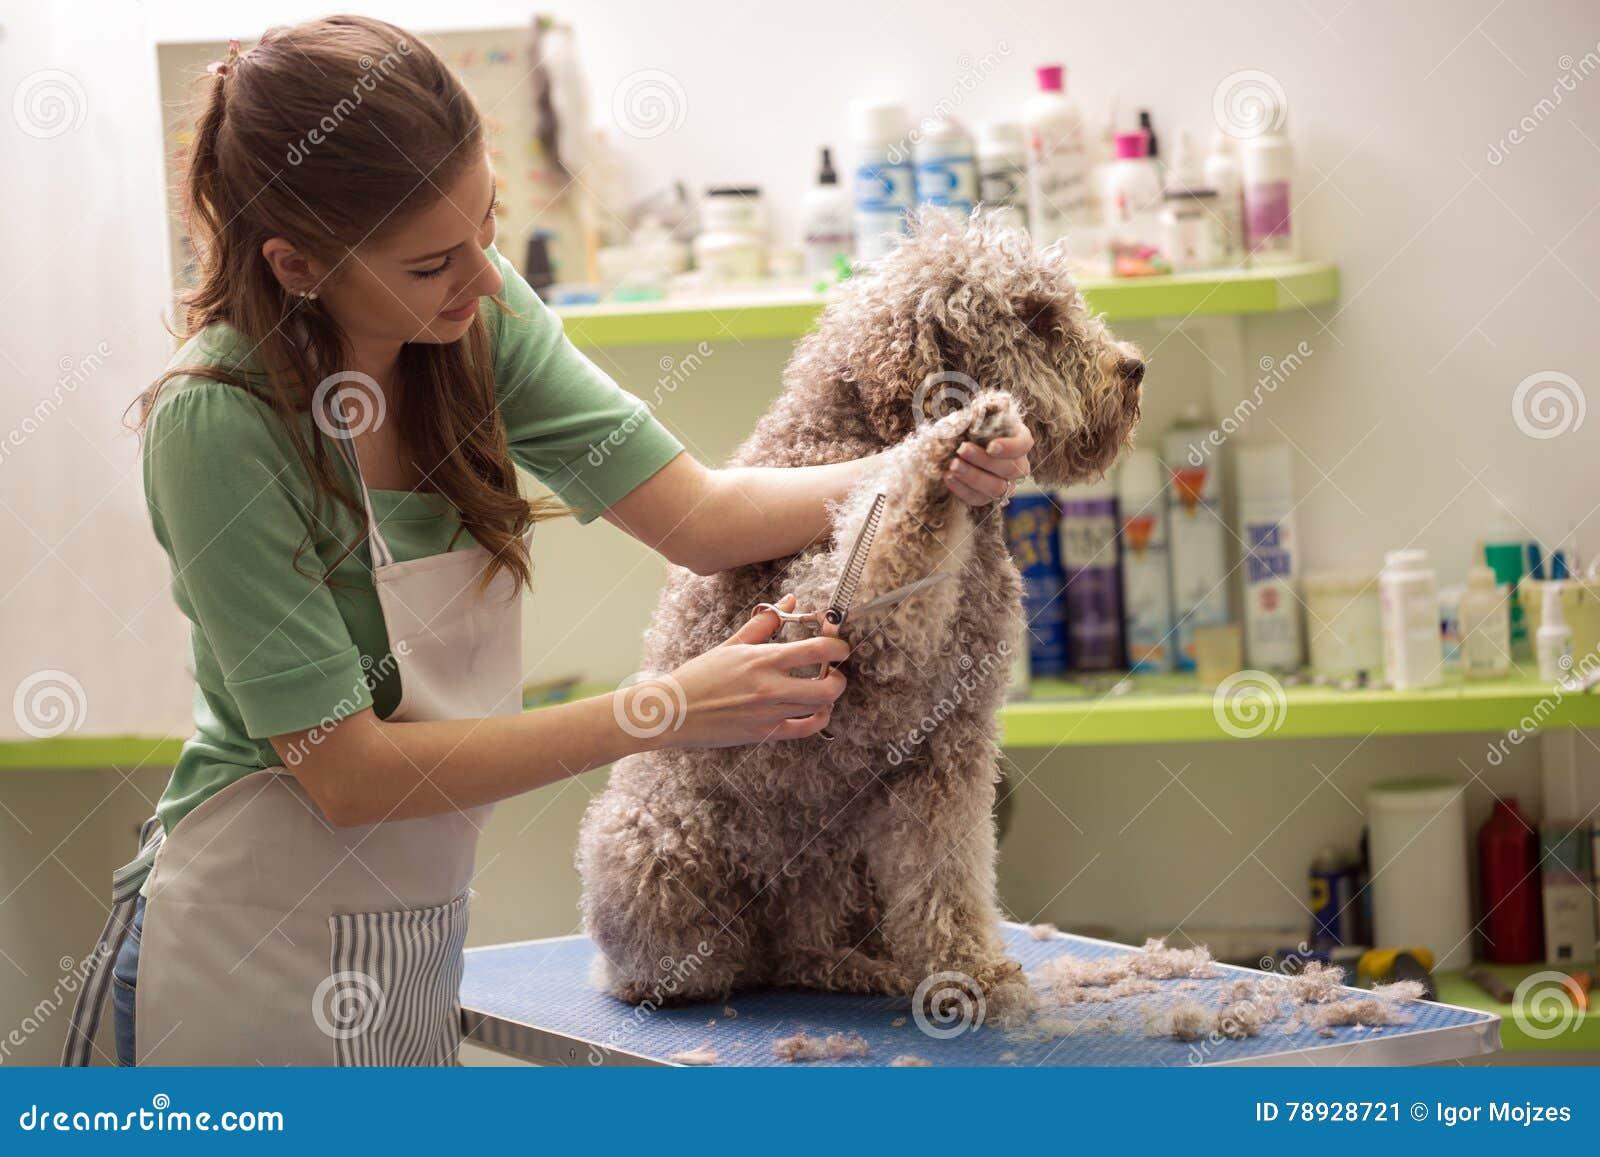 Groomer is cutting a dog hair